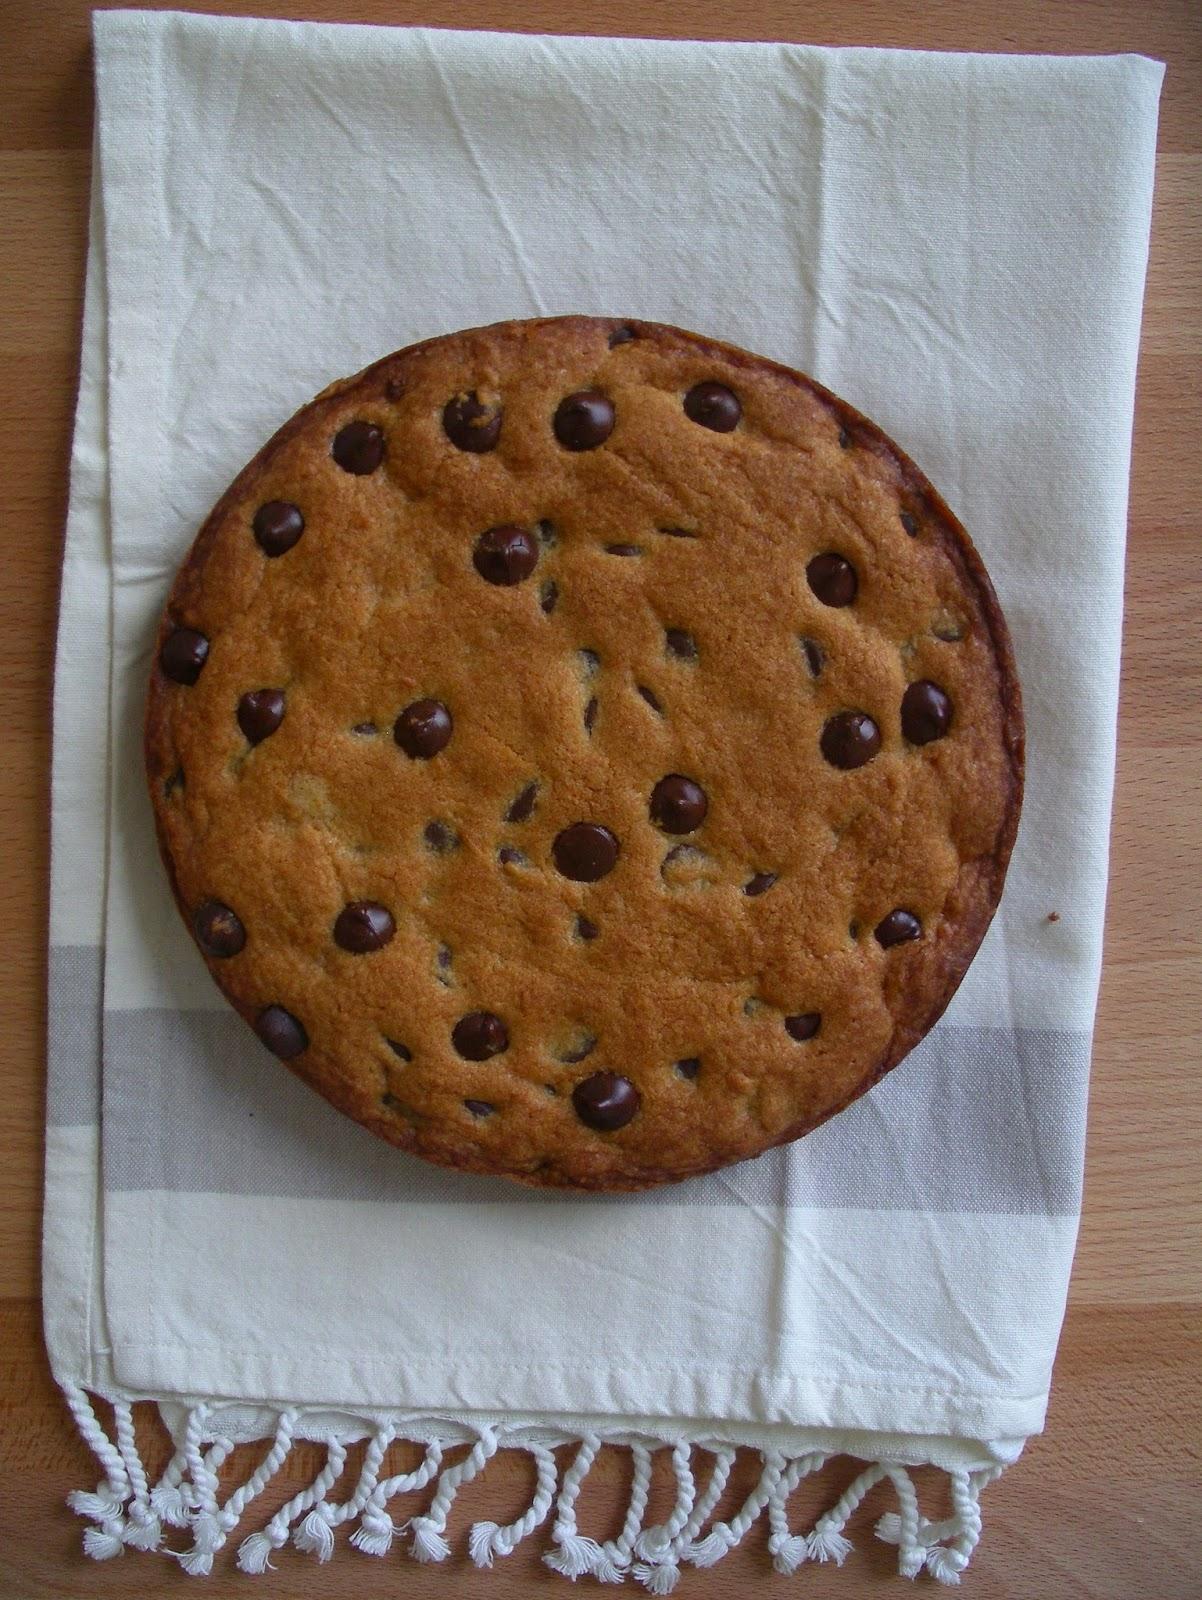 Chocolate Chip Cookie Dough Cake Kelly Luna